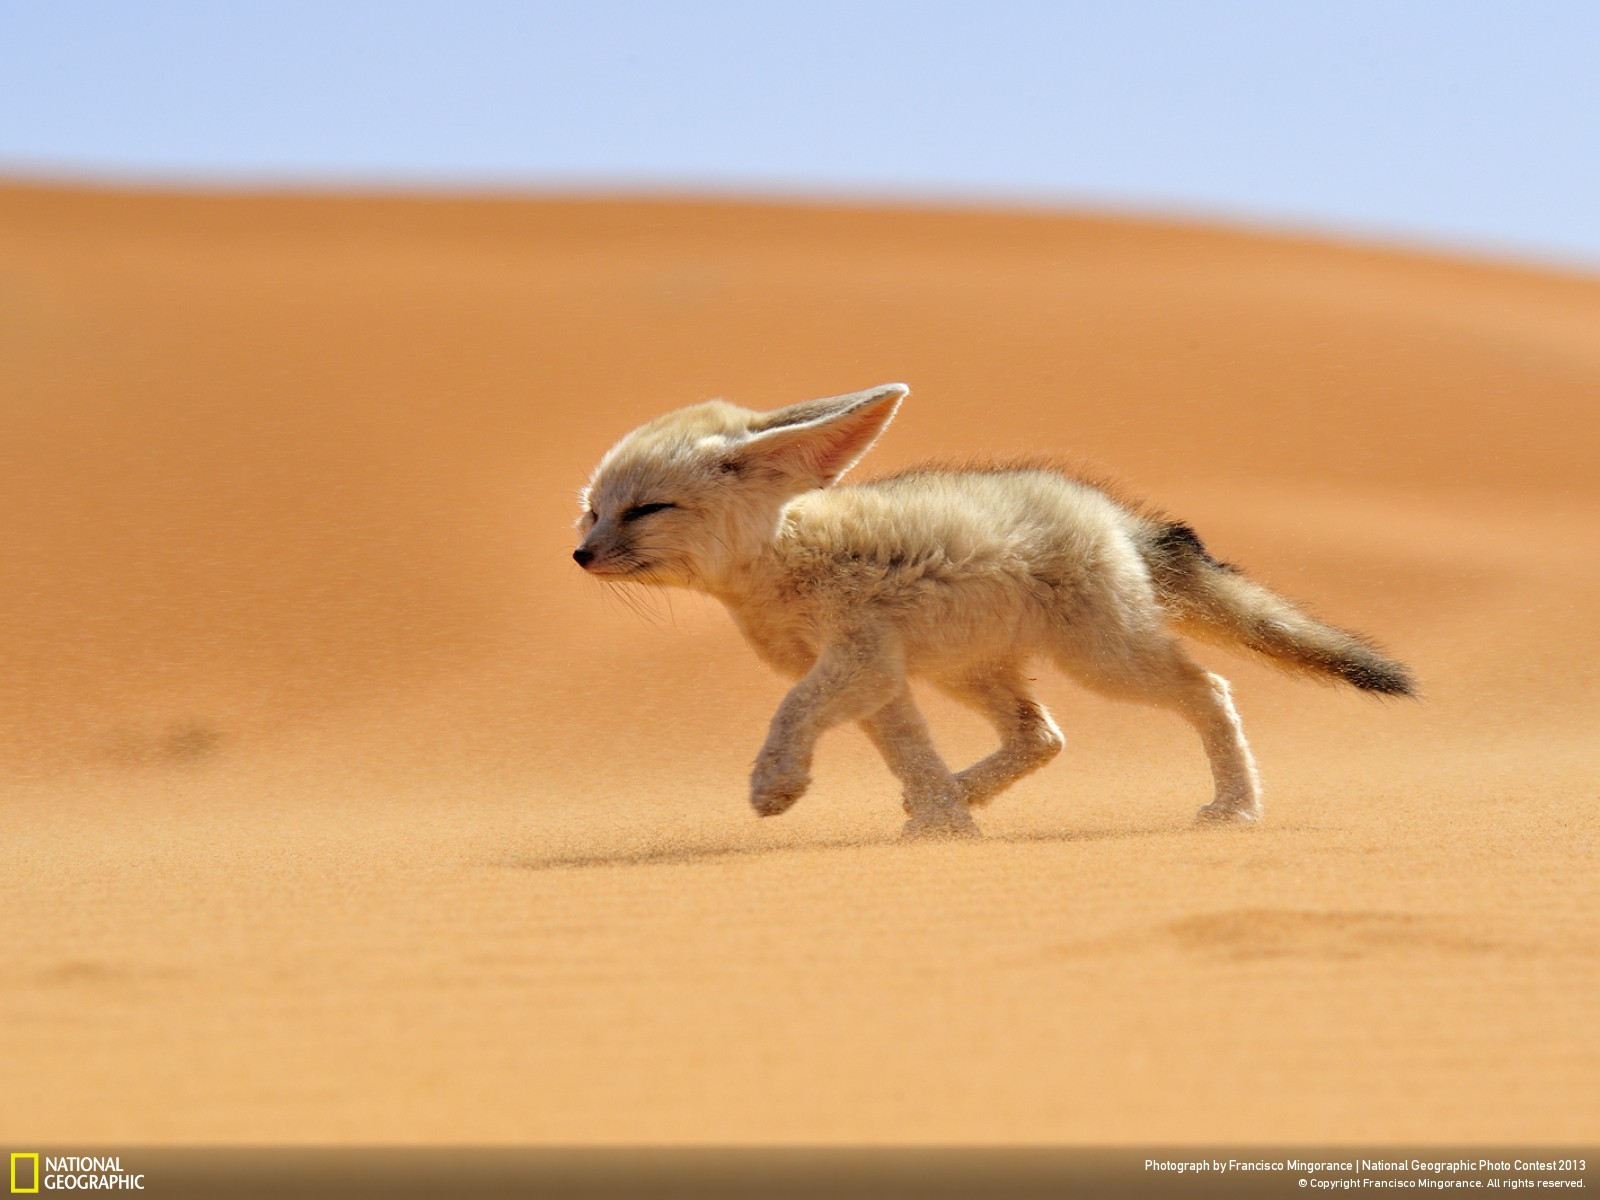 National Geographic best photos las mejores fotos del 2013 (1)